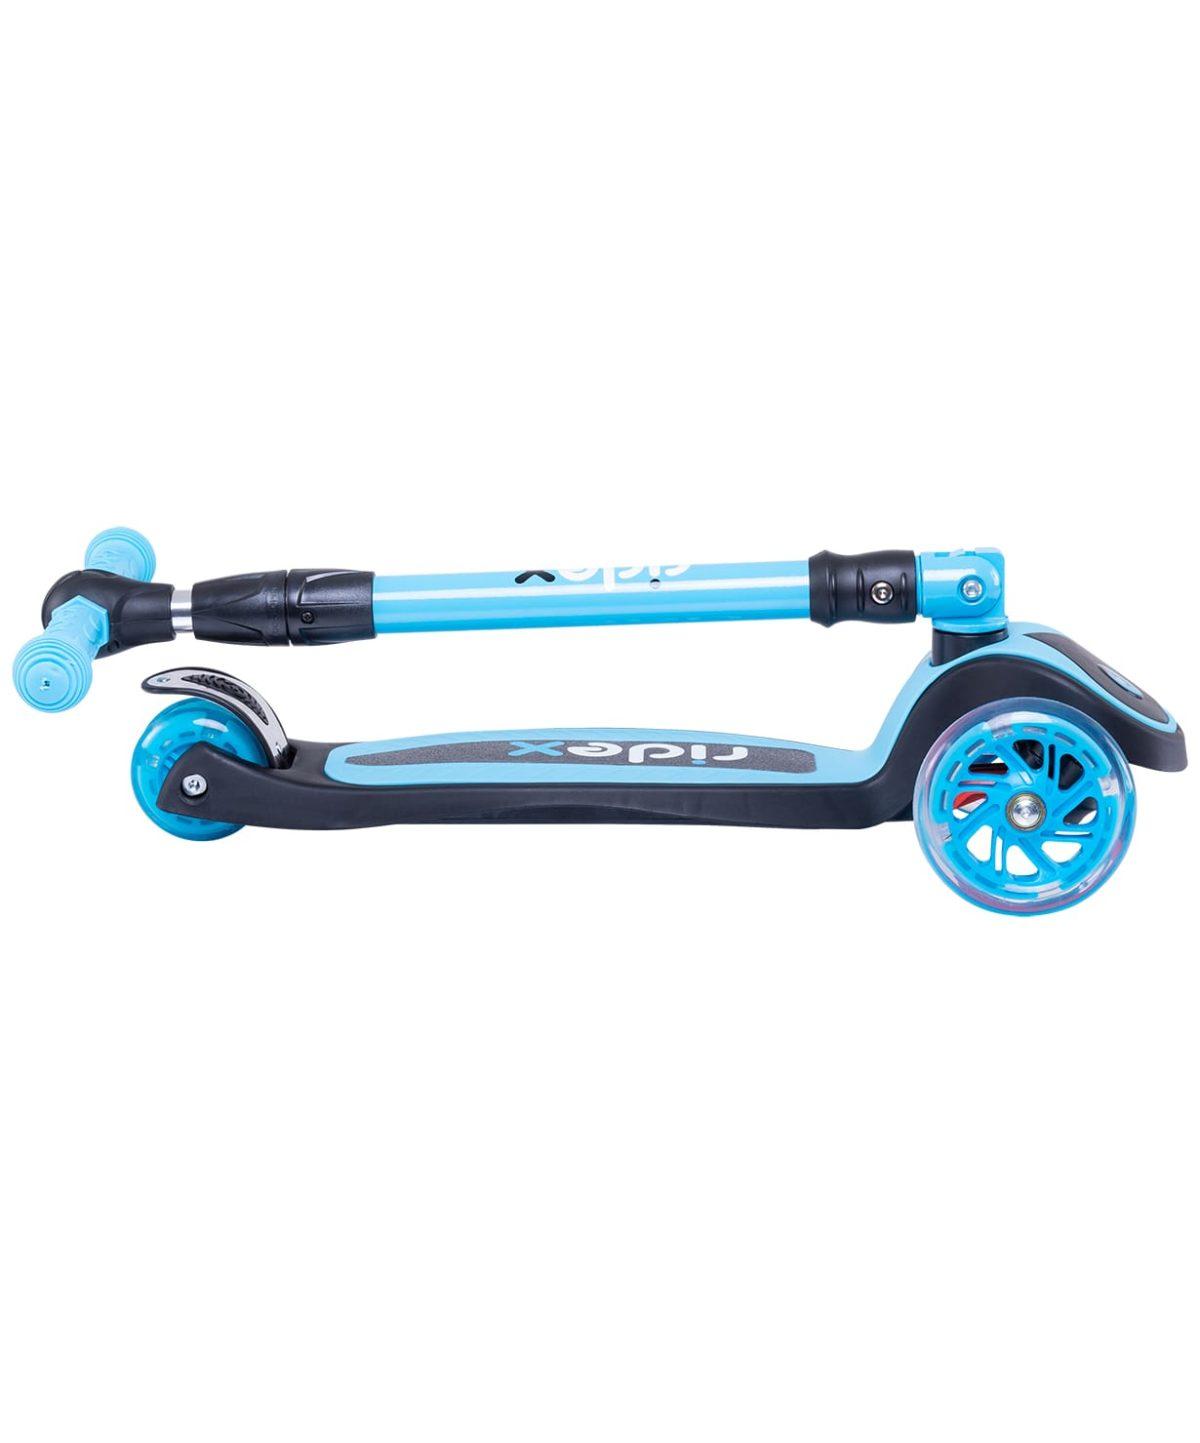 RIDEX 3D Tiny Tot Самокат 3-колесный Tiny Tot 120/80 мм  Tiny Tot: голубой - 5